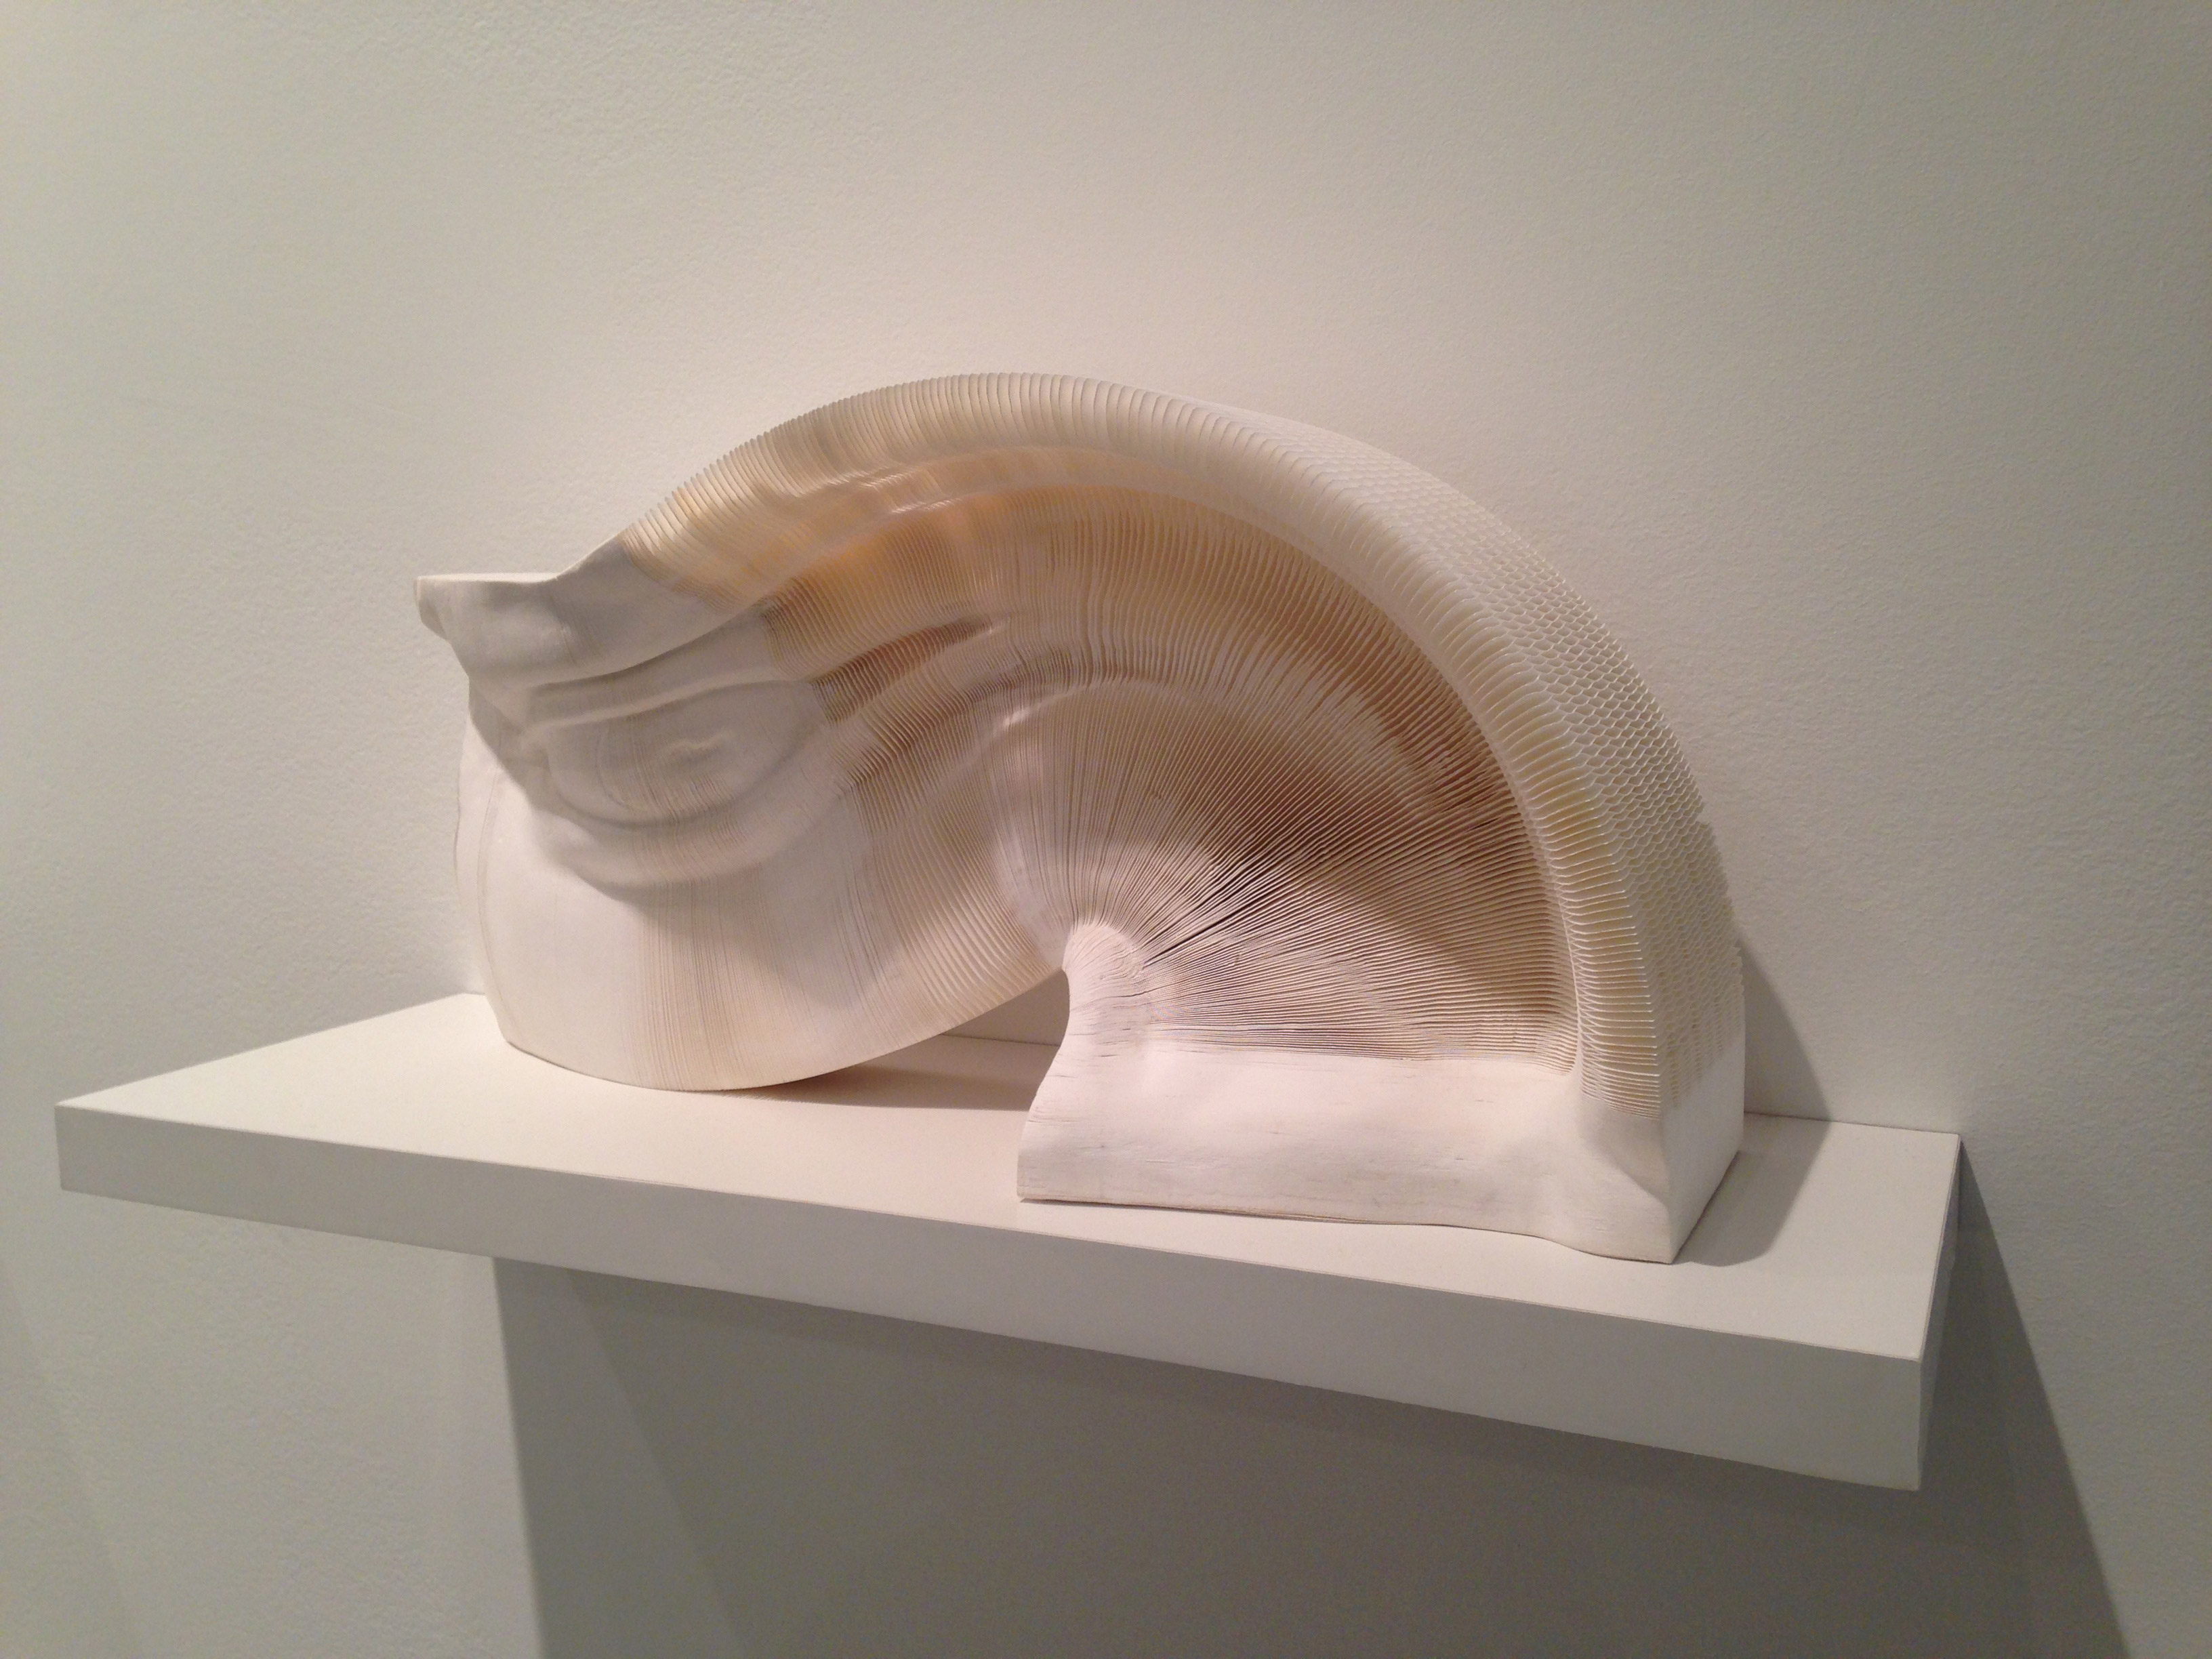 paper-sculptures-li-hongbo-20